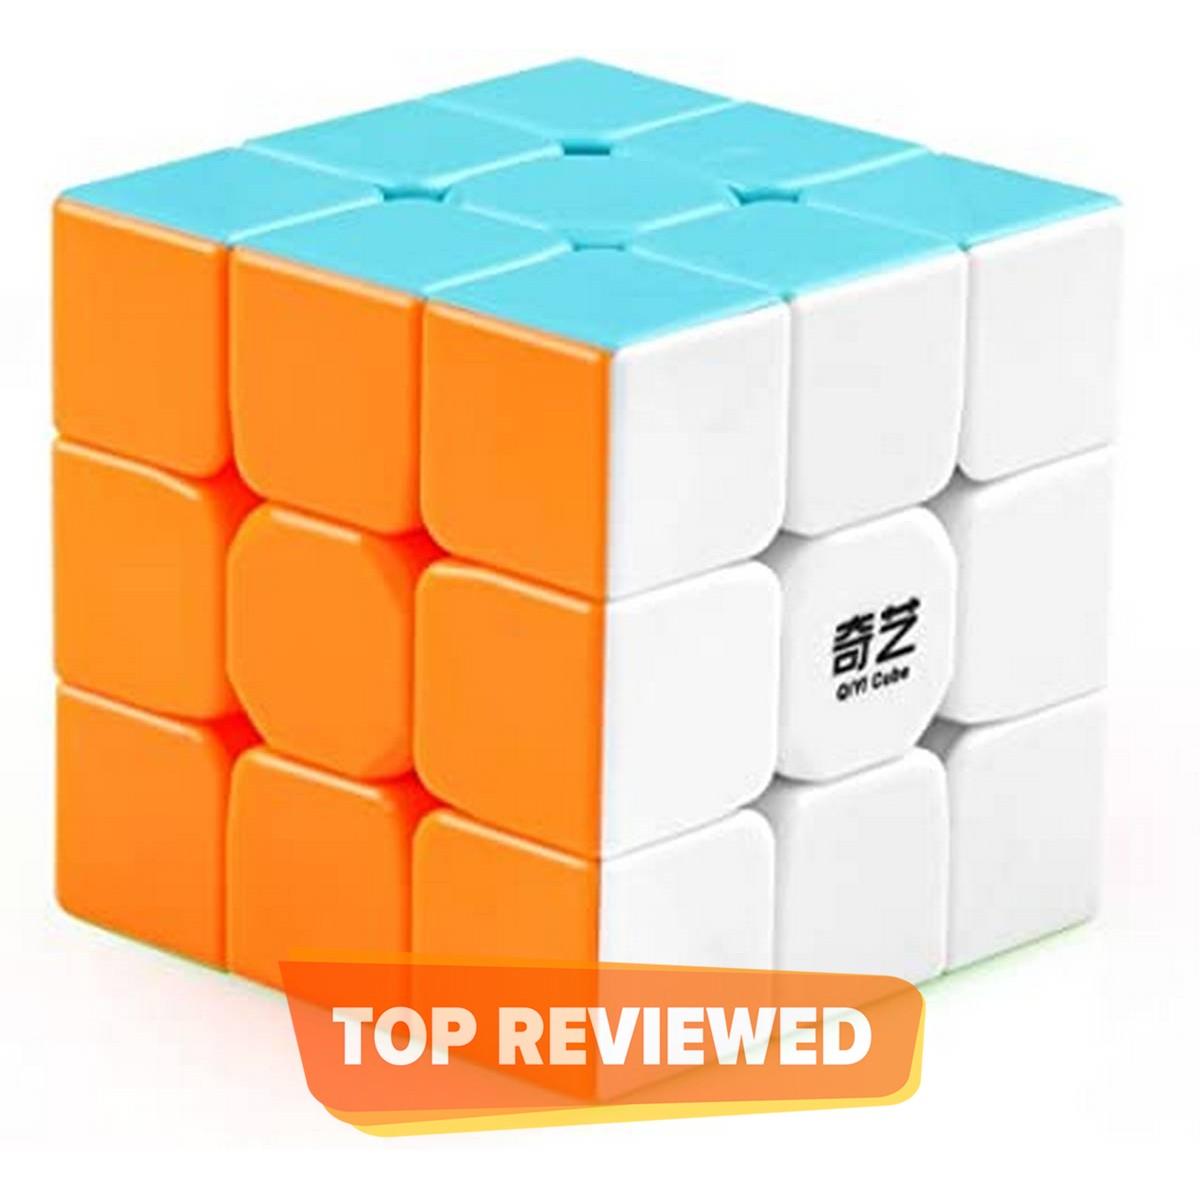 Rubiks Cube 3x3 Qiyi Warrior S Best Quality Fast Magic Rubik Speed Cube Puzzle Toys